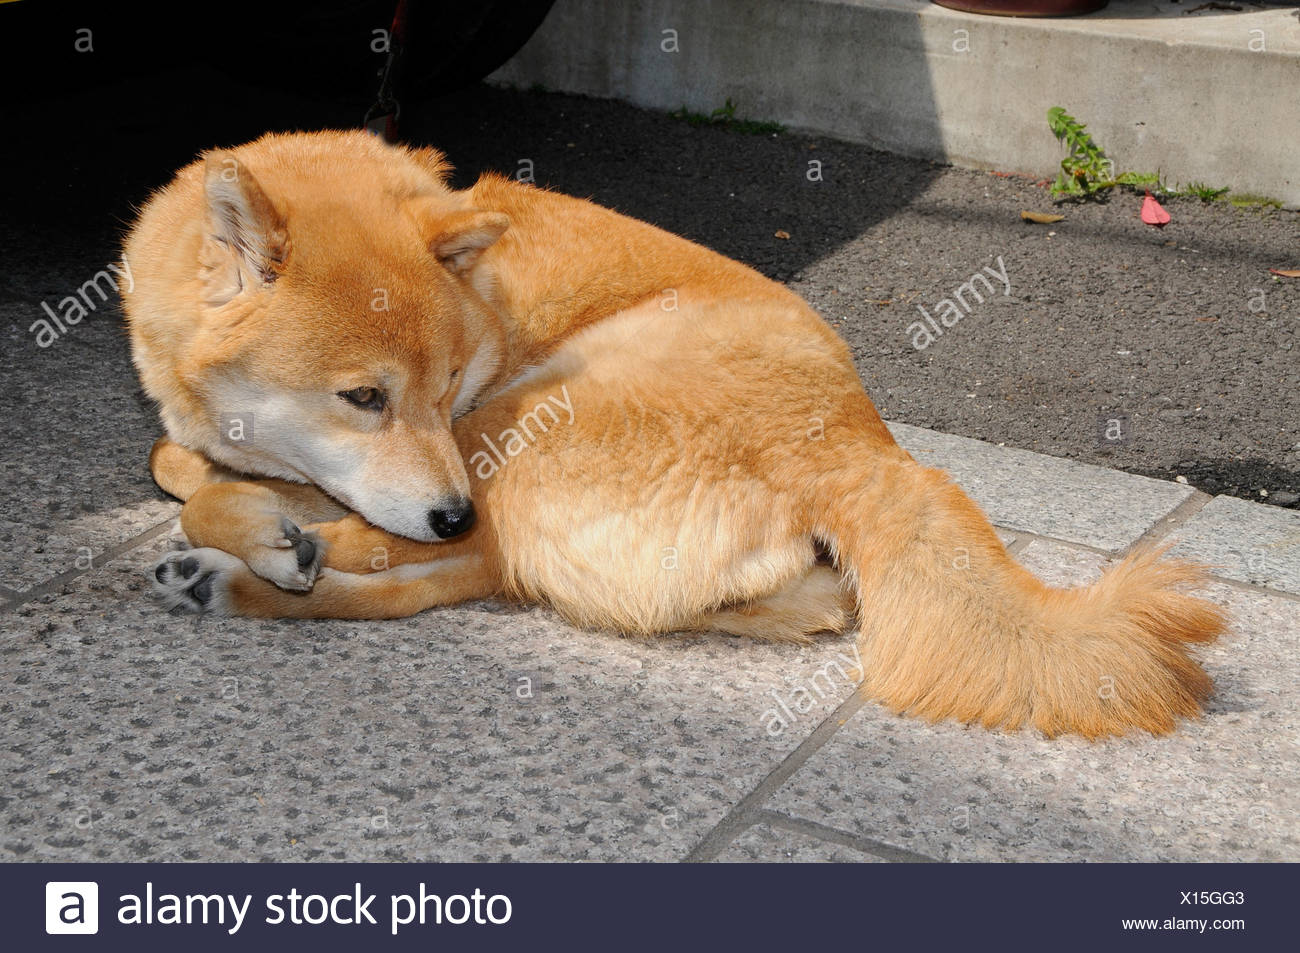 Hokkaido cane, Ainu cane, Ainu Inu, Hokkaido-Ken, Giapponese cane di razza, comune cane, Kyoto, Giappone, Asia Immagini Stock